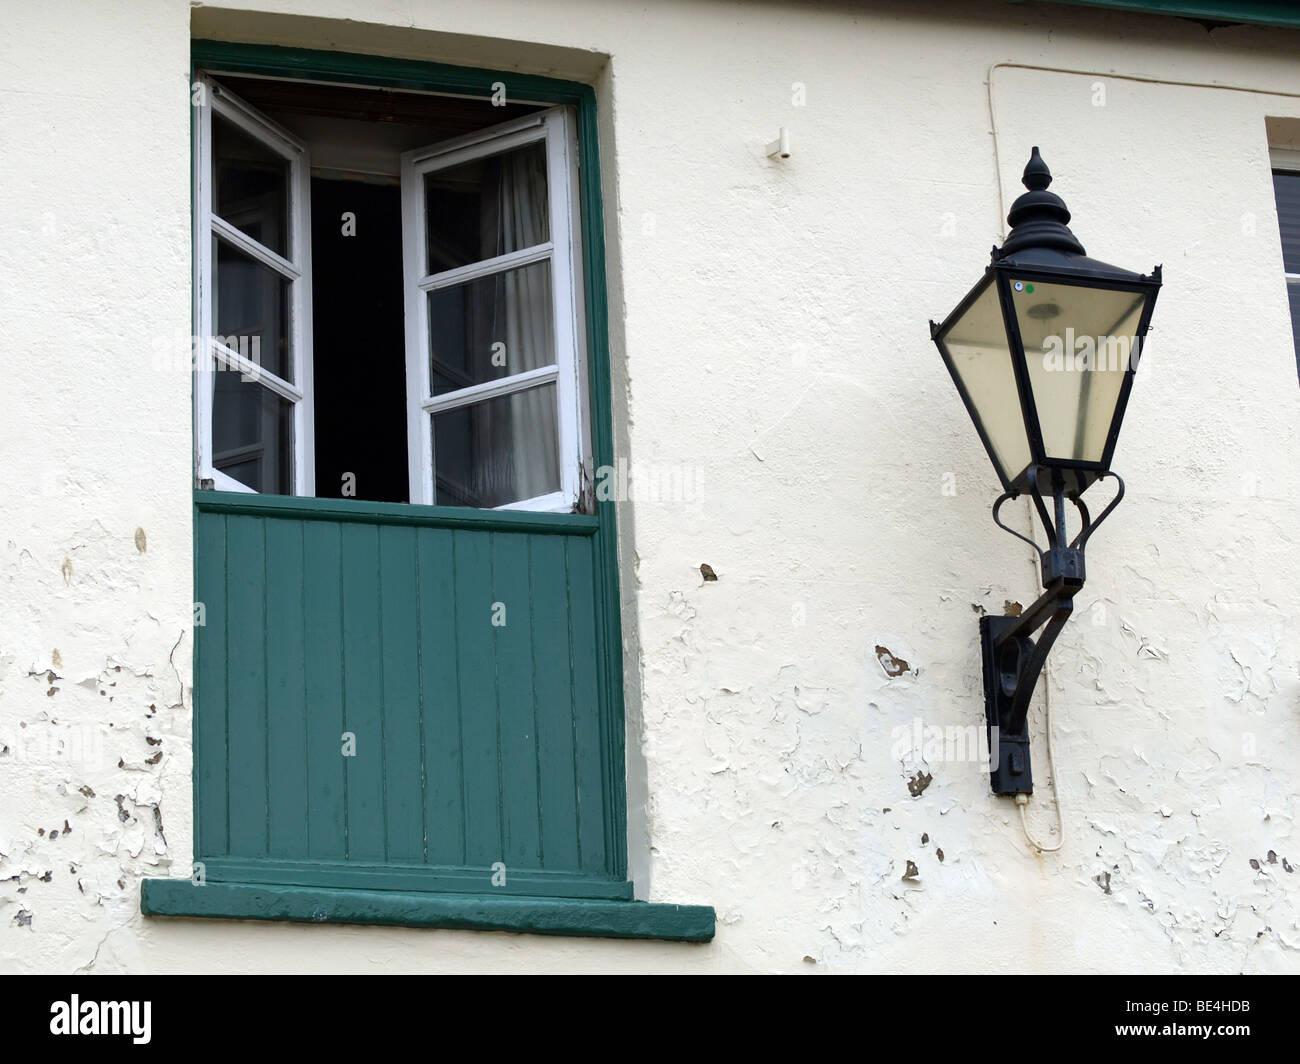 Converted hayloft door and gas lantern at Wareham,Dorset. - Stock Image